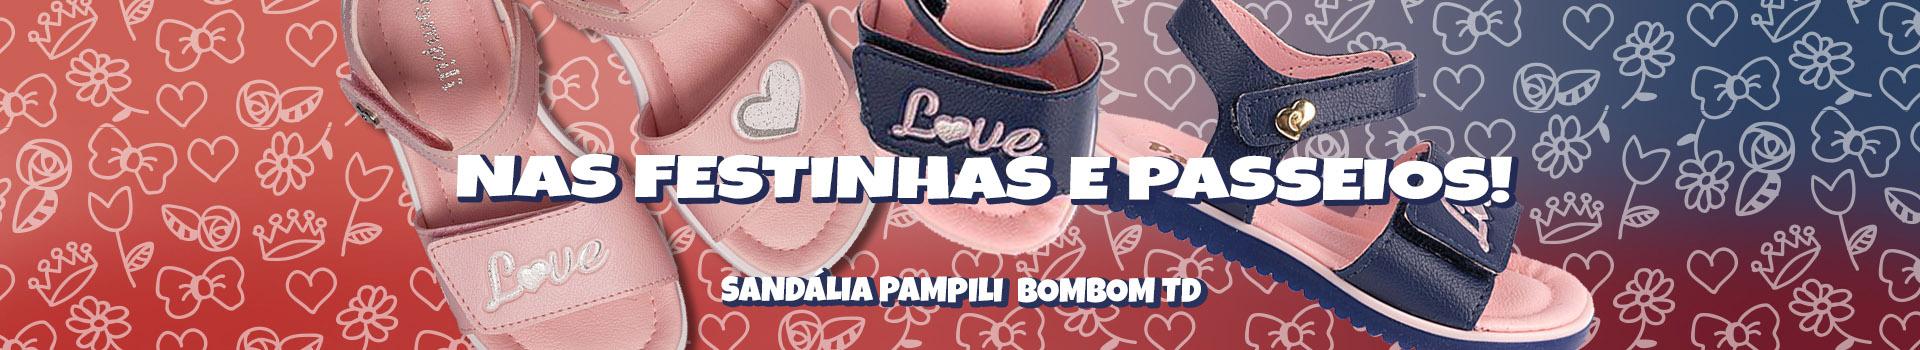 TV4-Pampili_Bombom